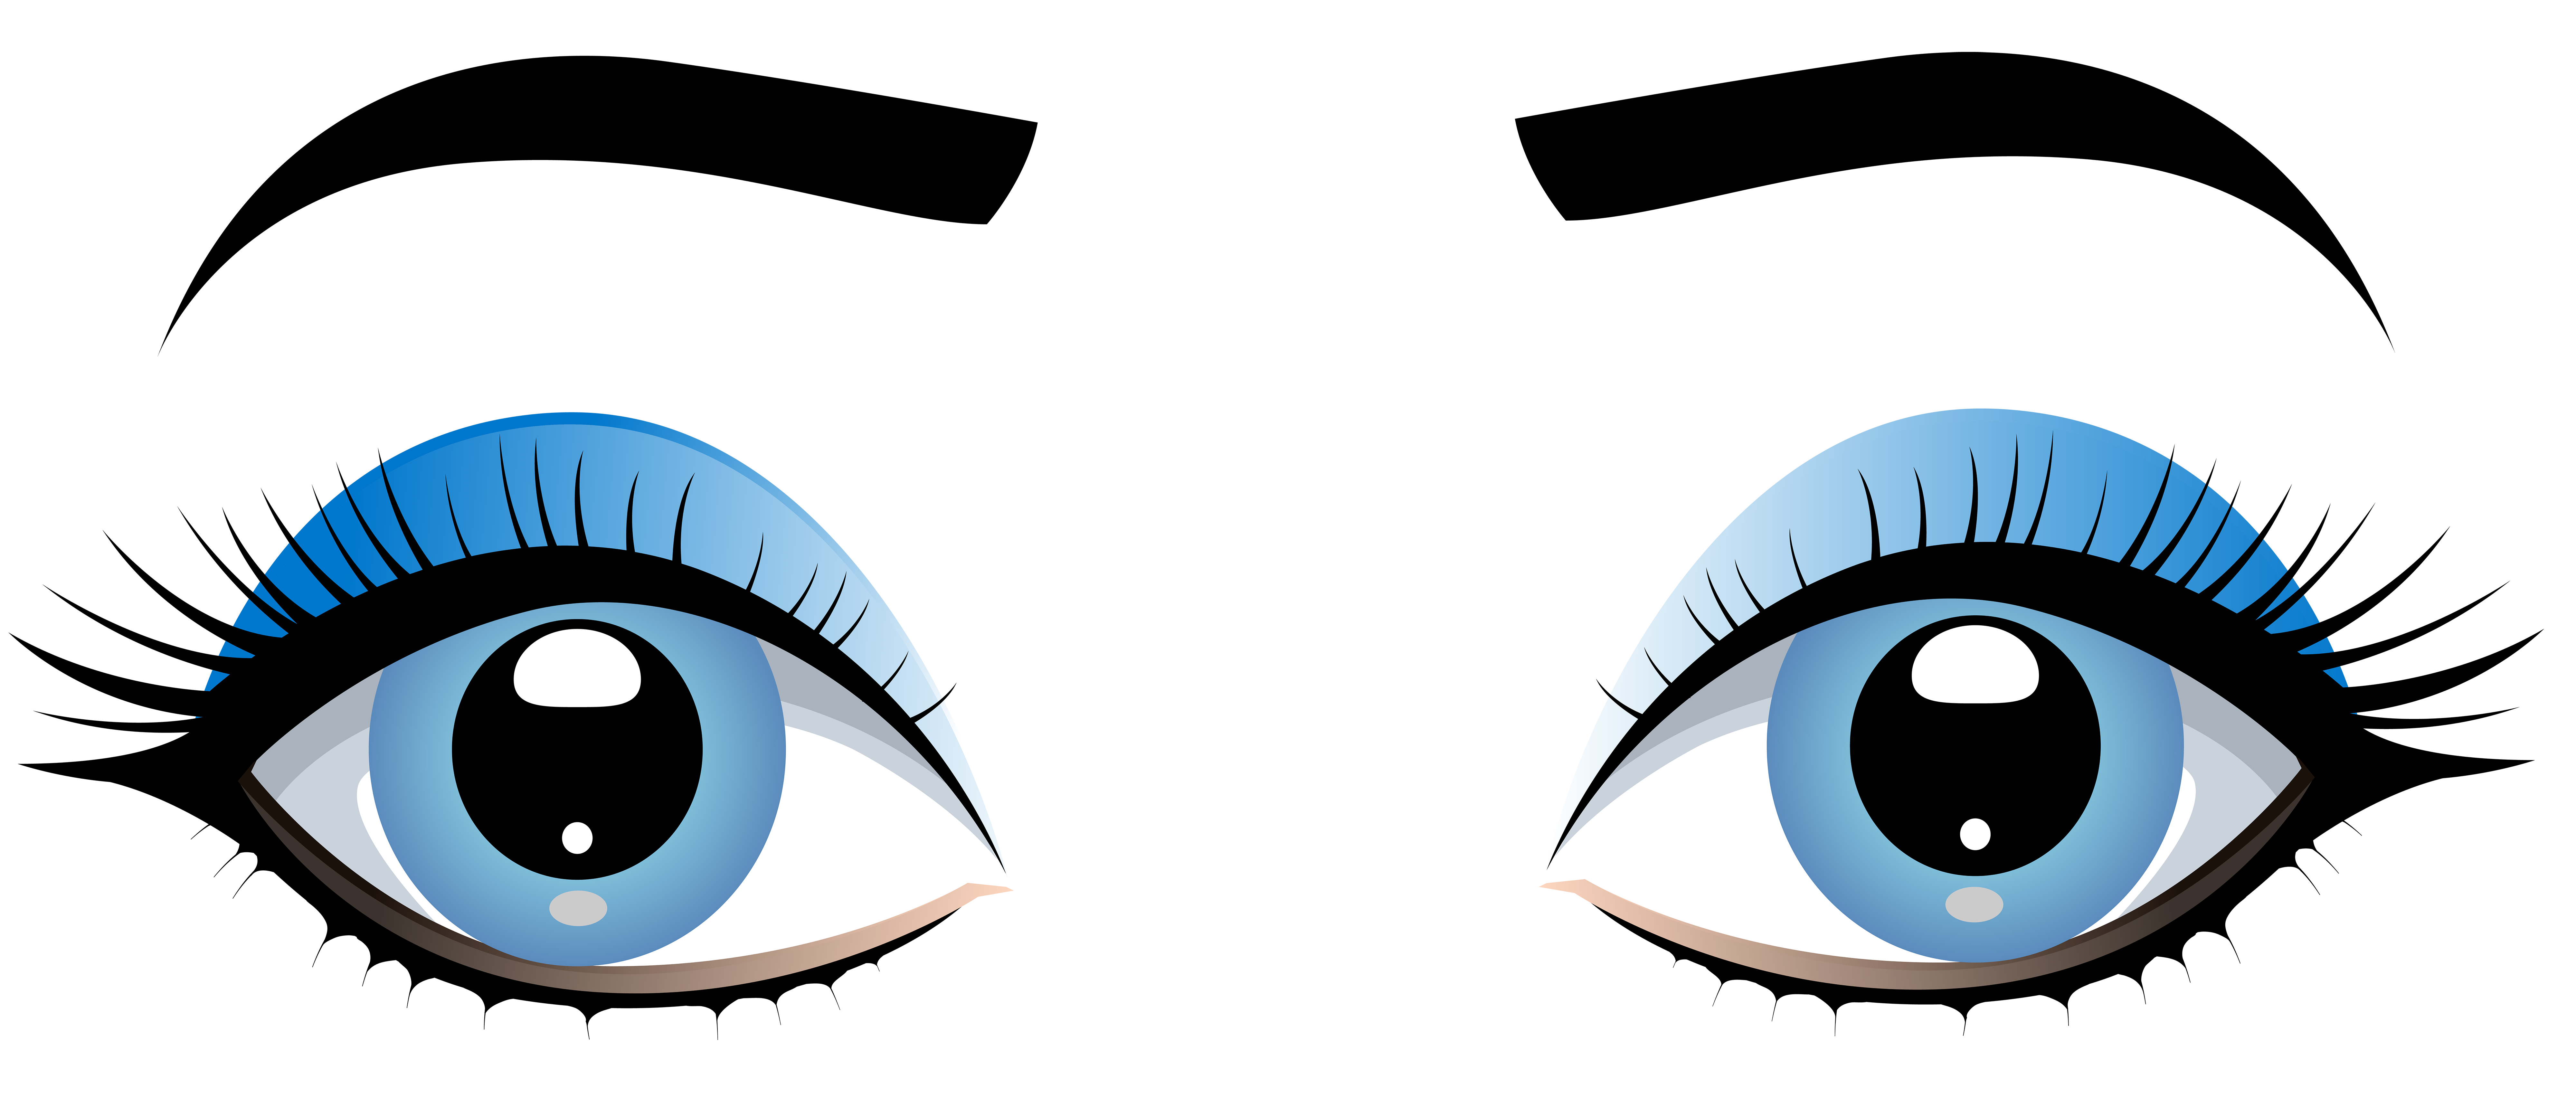 8000x3410 Eye Clipart Png Transparent